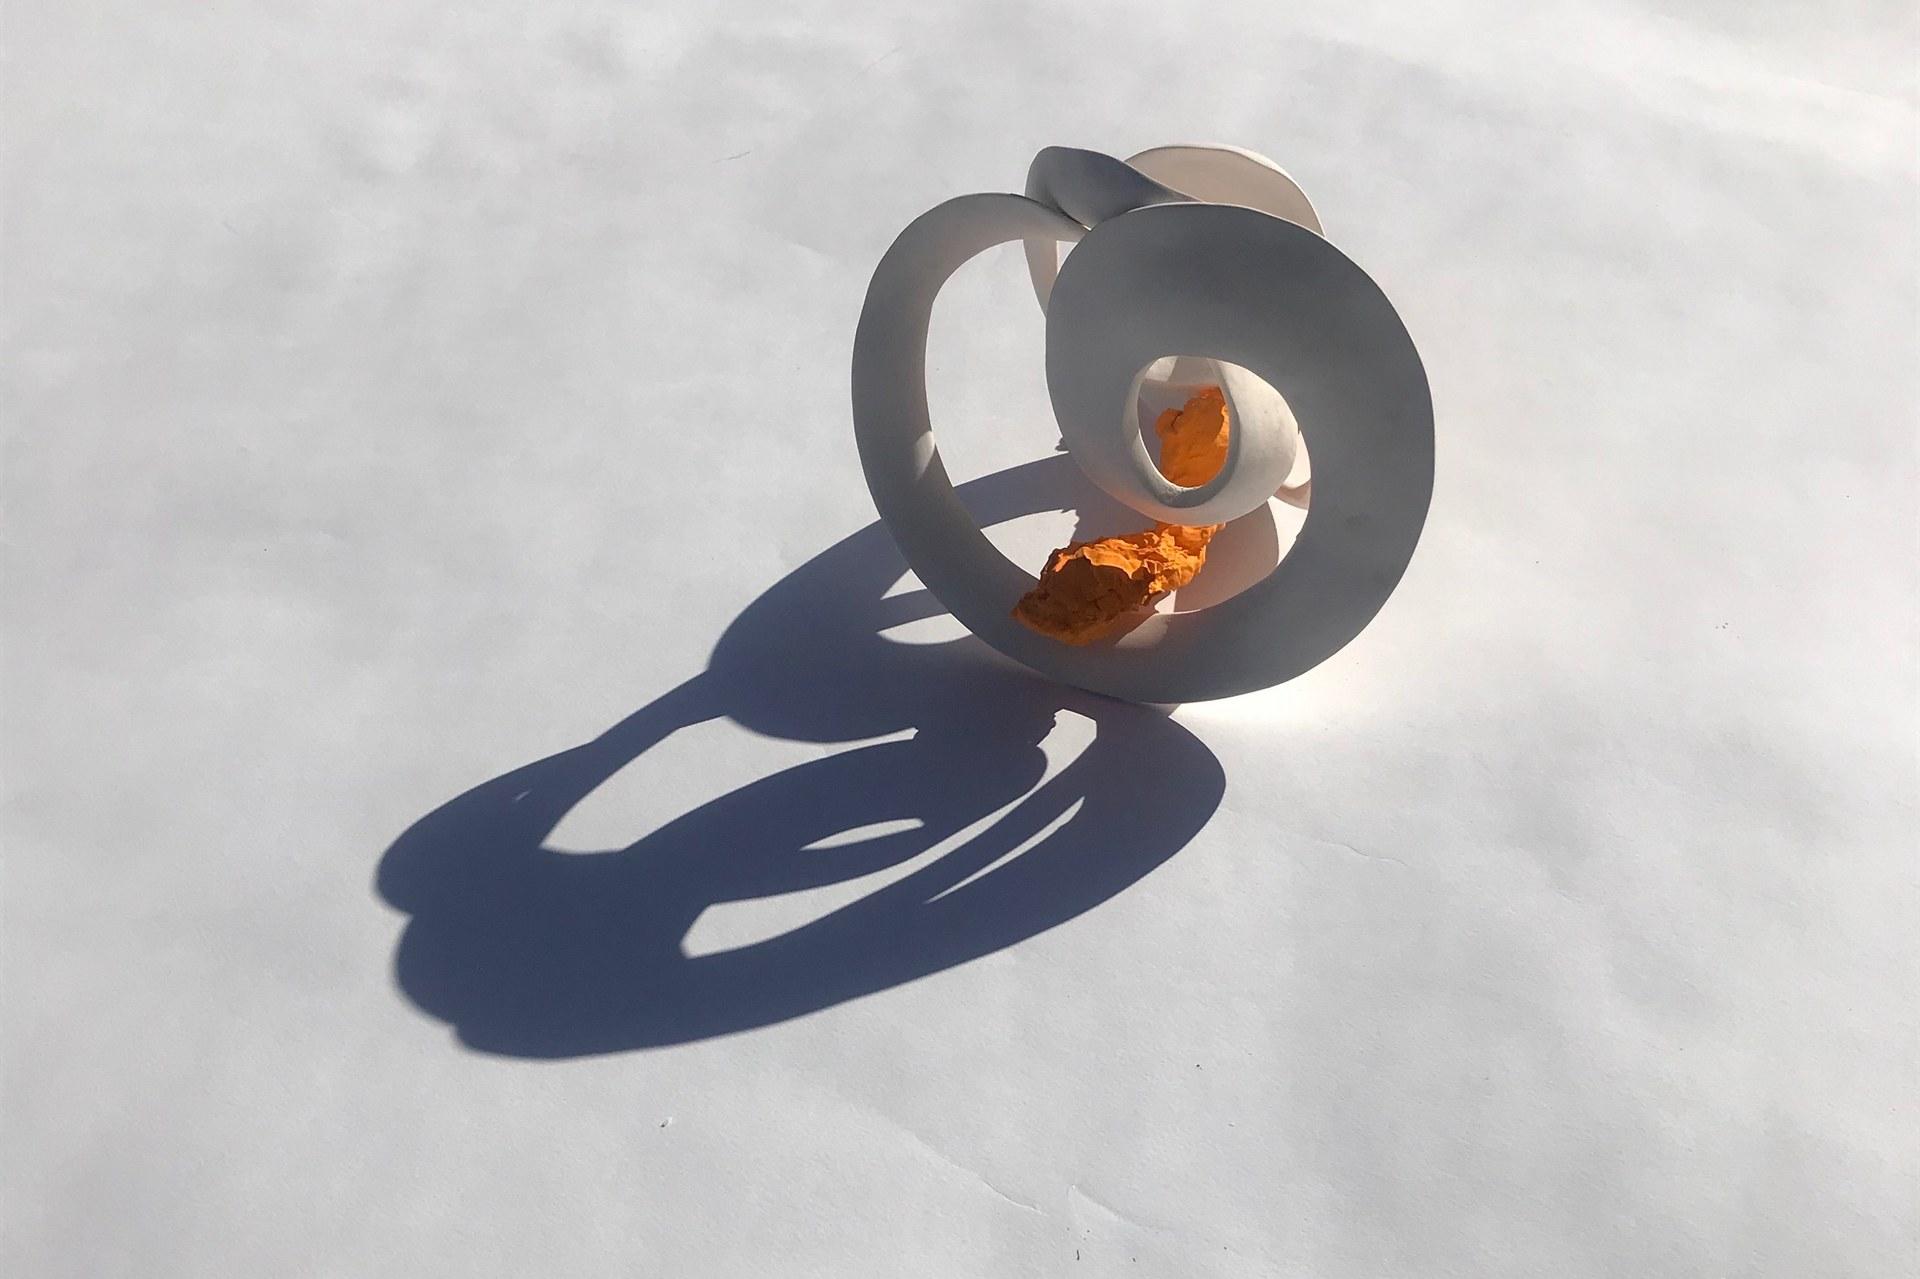 'Rotation 1' with Orange